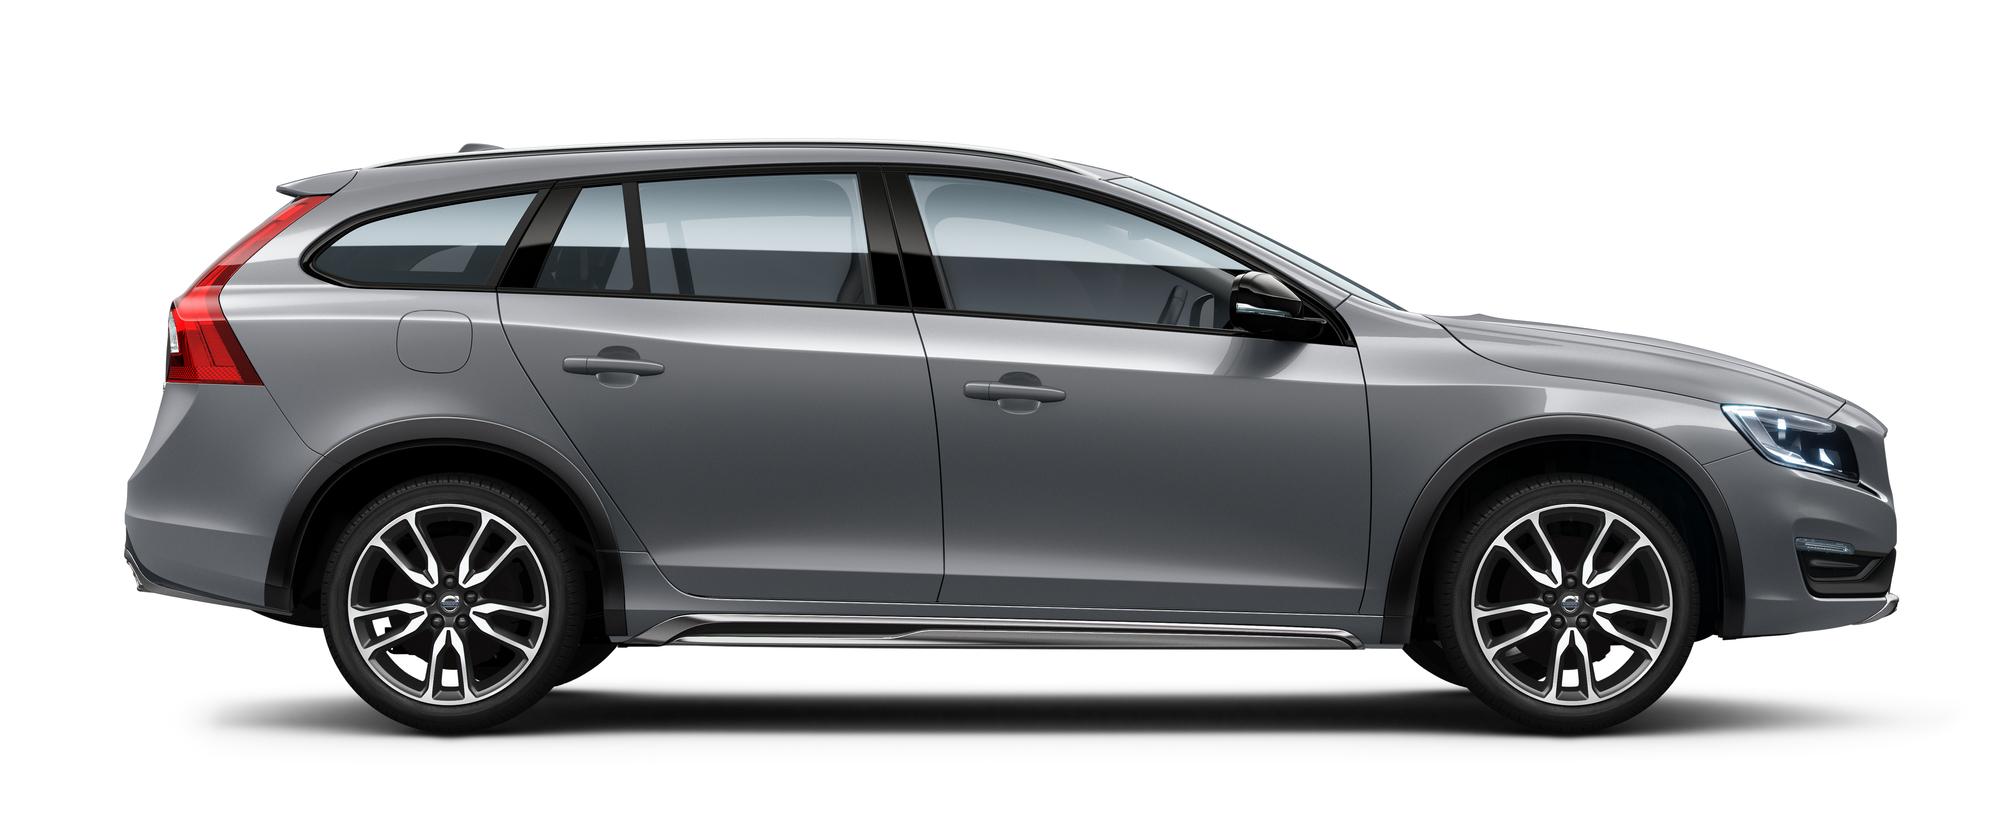 Volvo V60 Cross Country - Capitol MotorsCapitol Motors